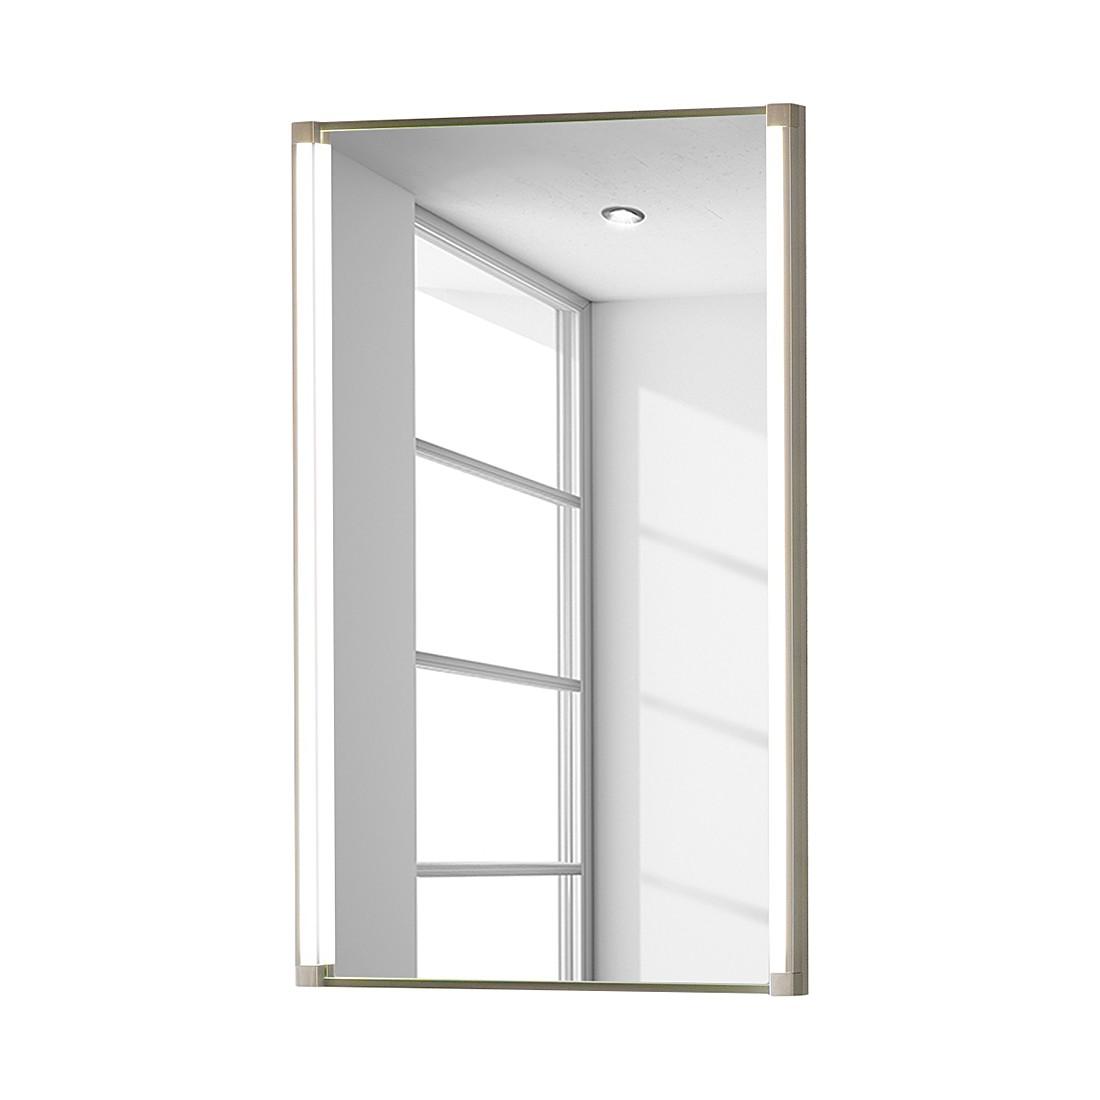 EEK A+, Wandspiegel - LED-Strips - 40 cm, Fackelmann